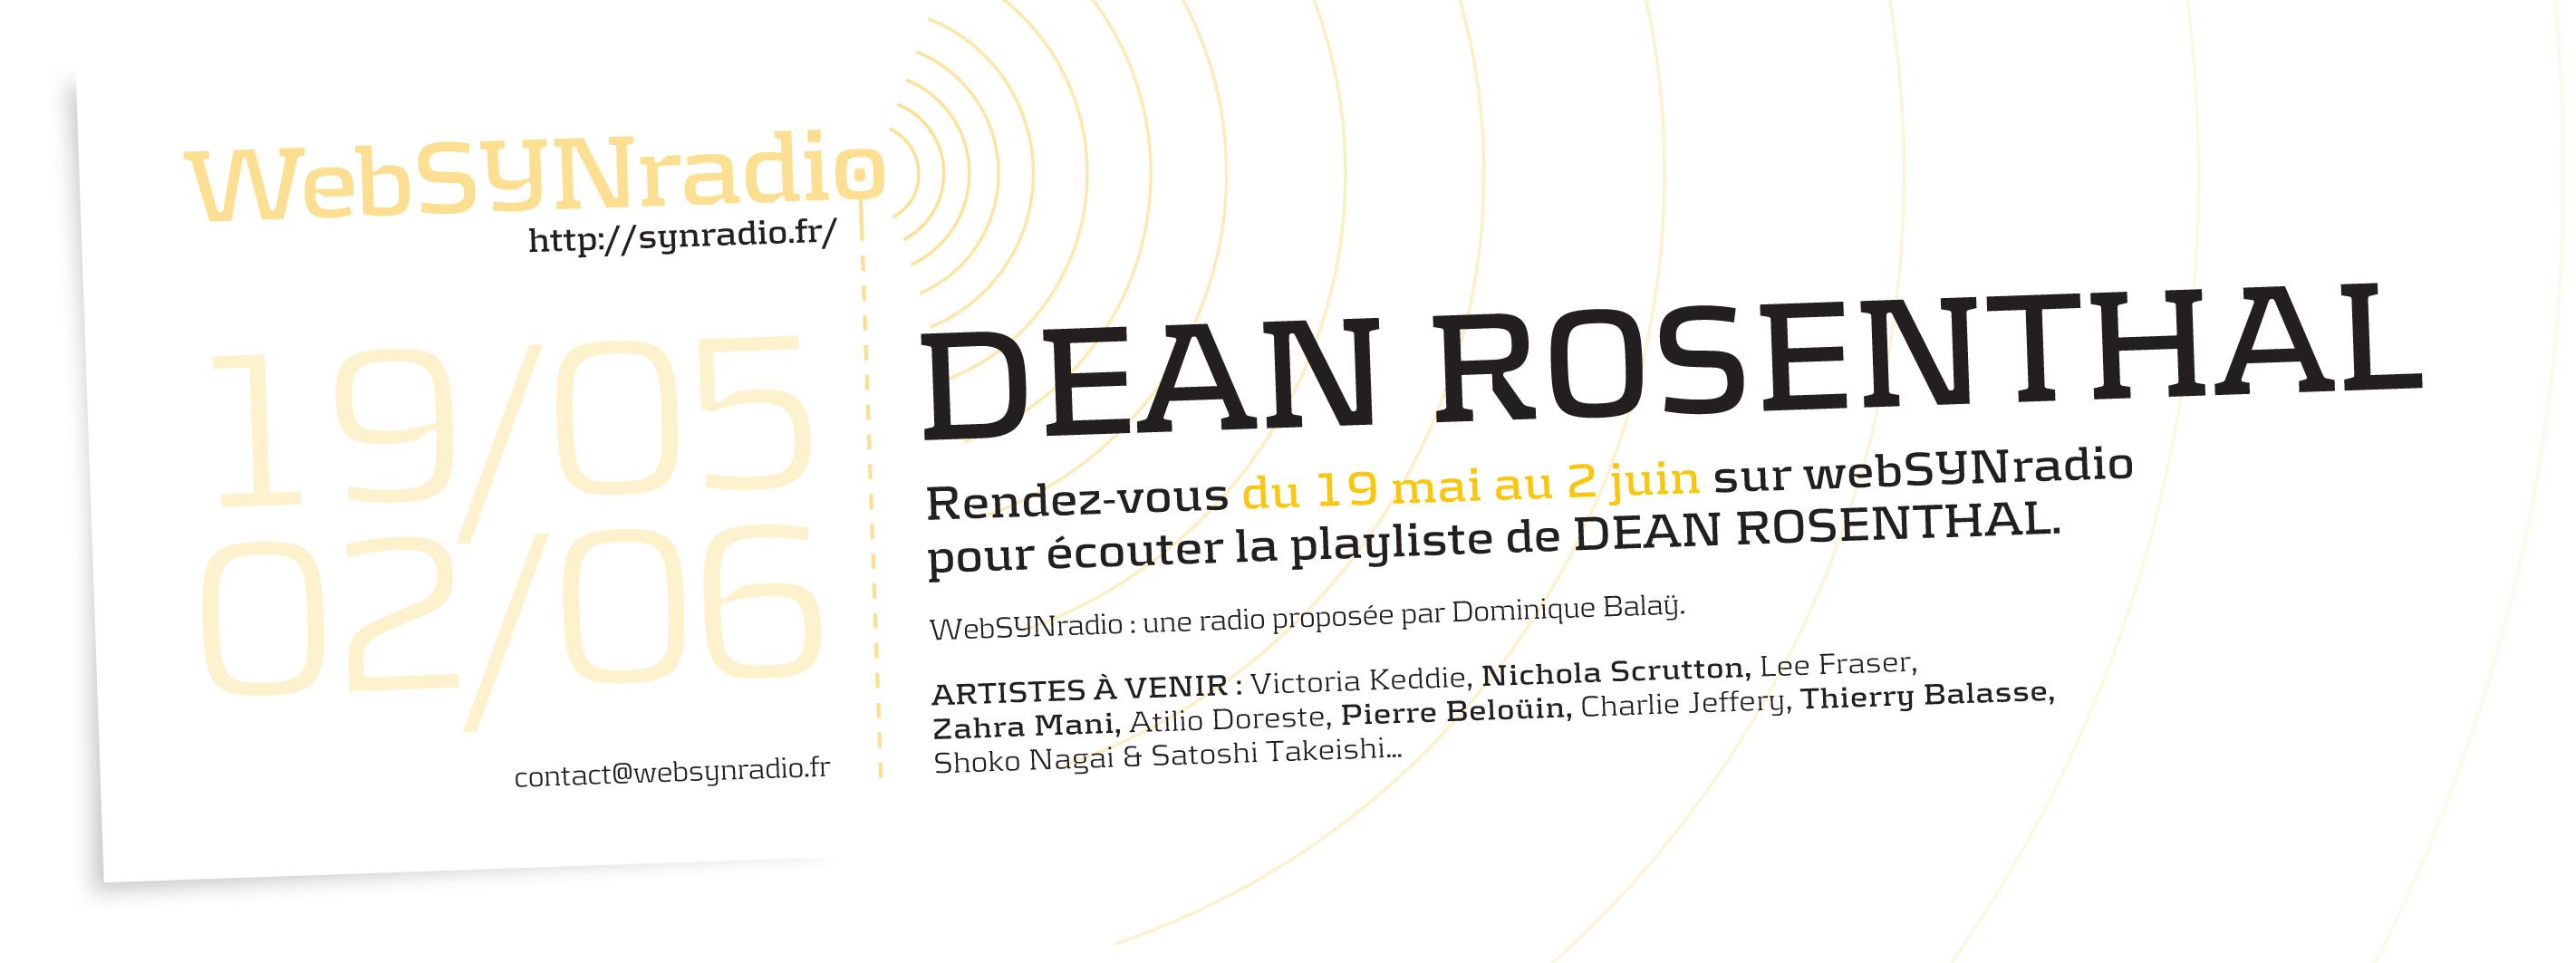 SYN-flyer206-Dean-Rosenthal-fra